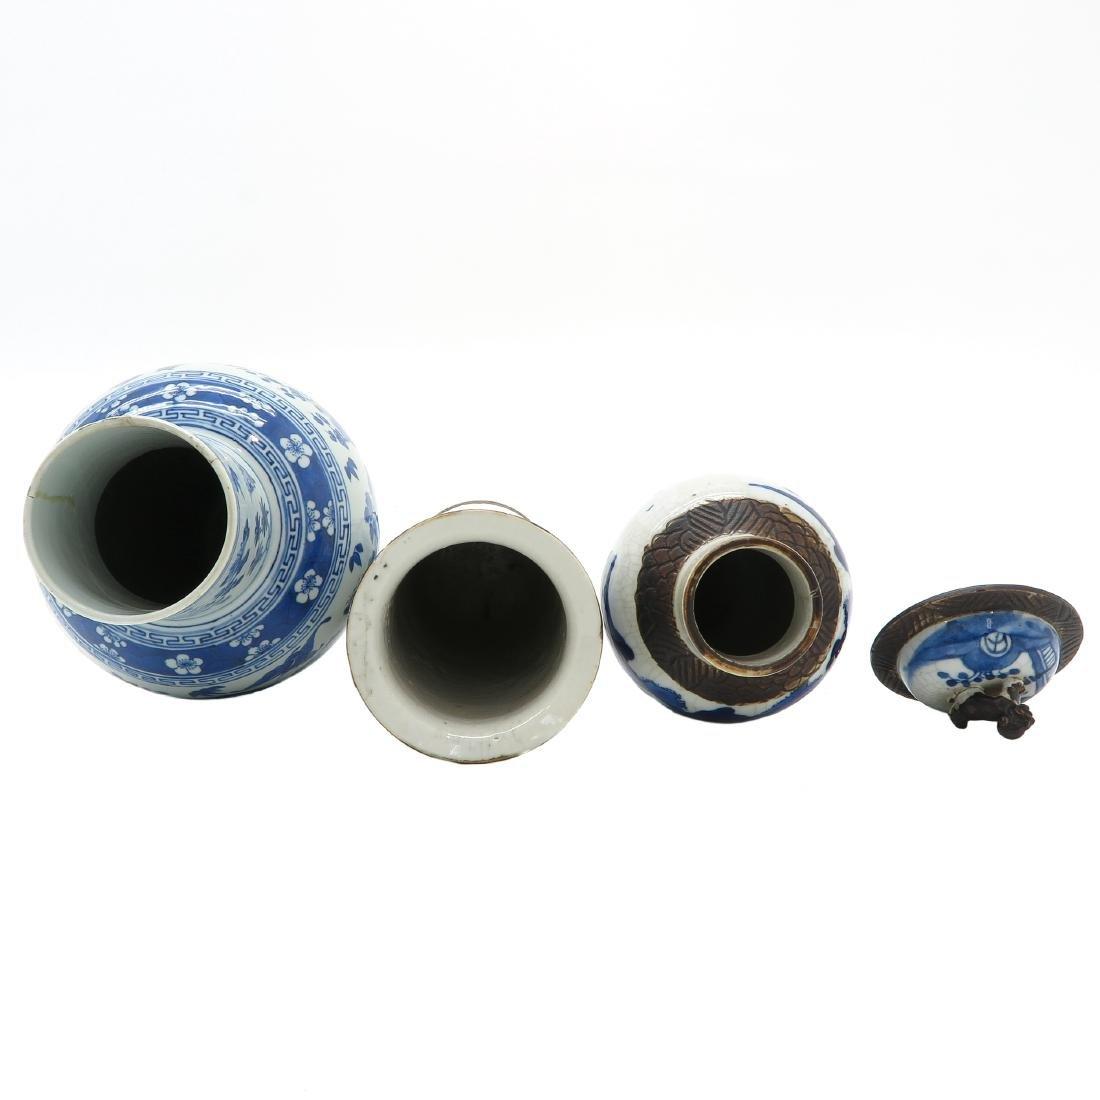 Lot of 3 Vases - 4